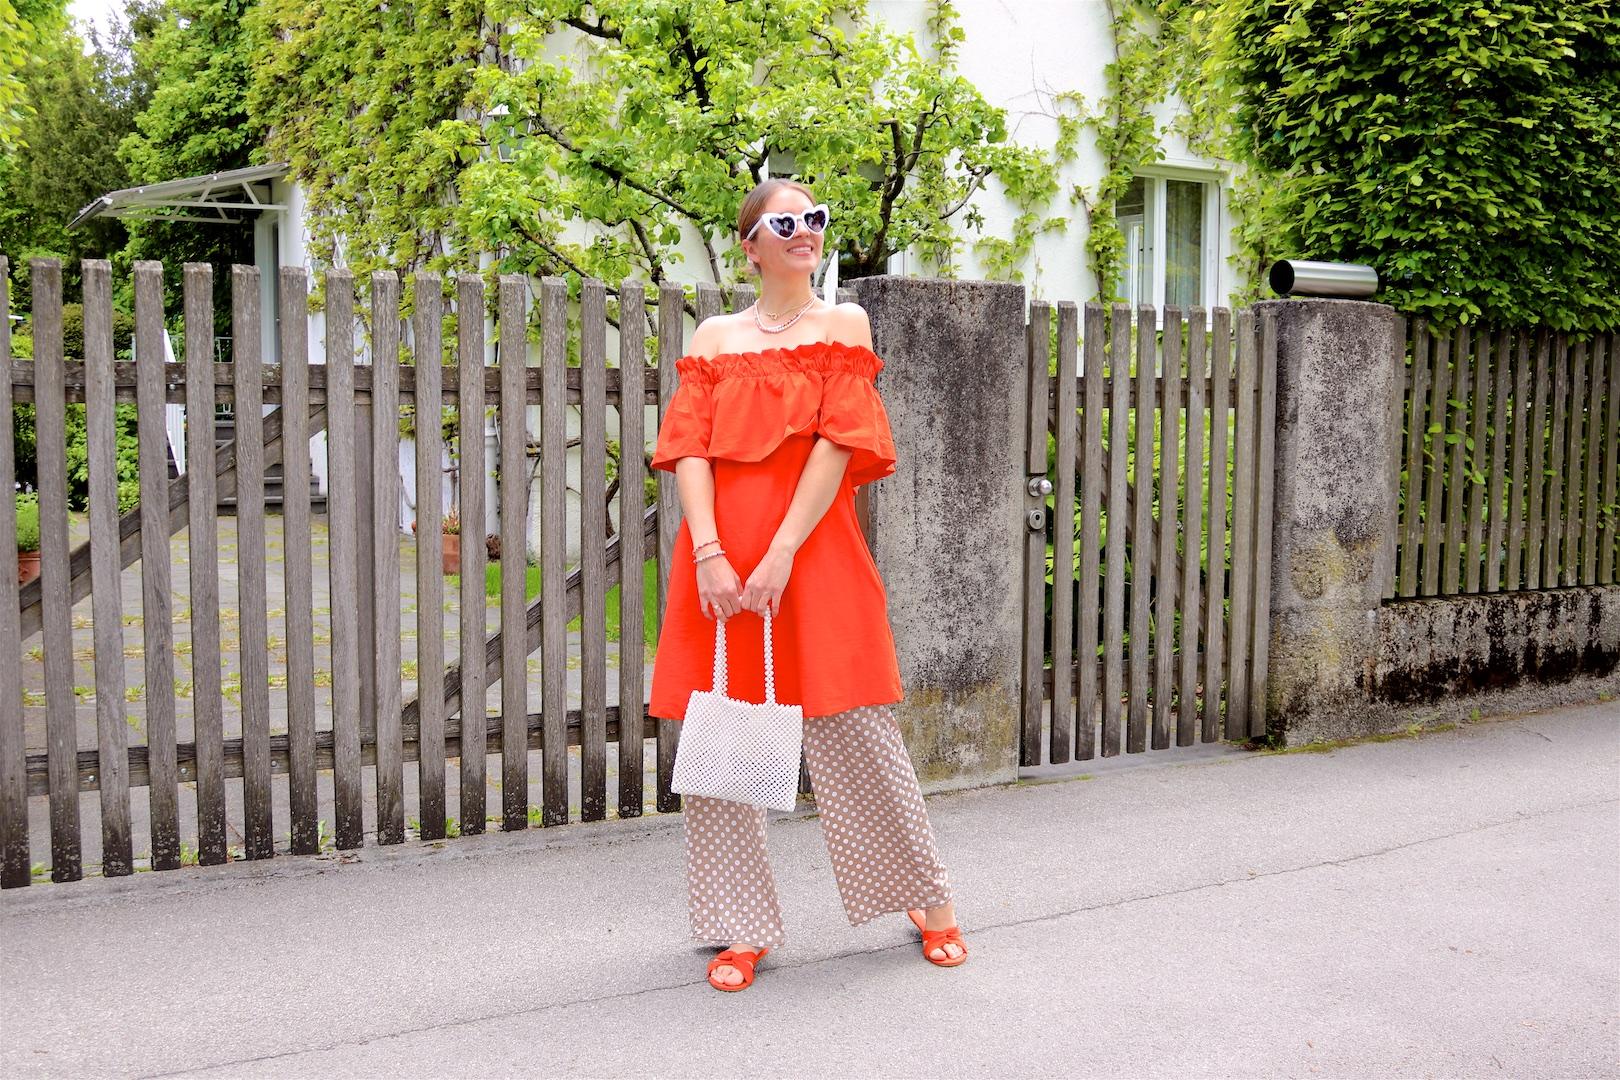 Orange & Polka Dots. Fashion and Style Blog Girl from Heartfelt Hunt. Girl with blonde, low bun wearing an orange off-shoulder dress, polka dot pants, white heart shaped sunglasses, pearl bag and orange sandals.